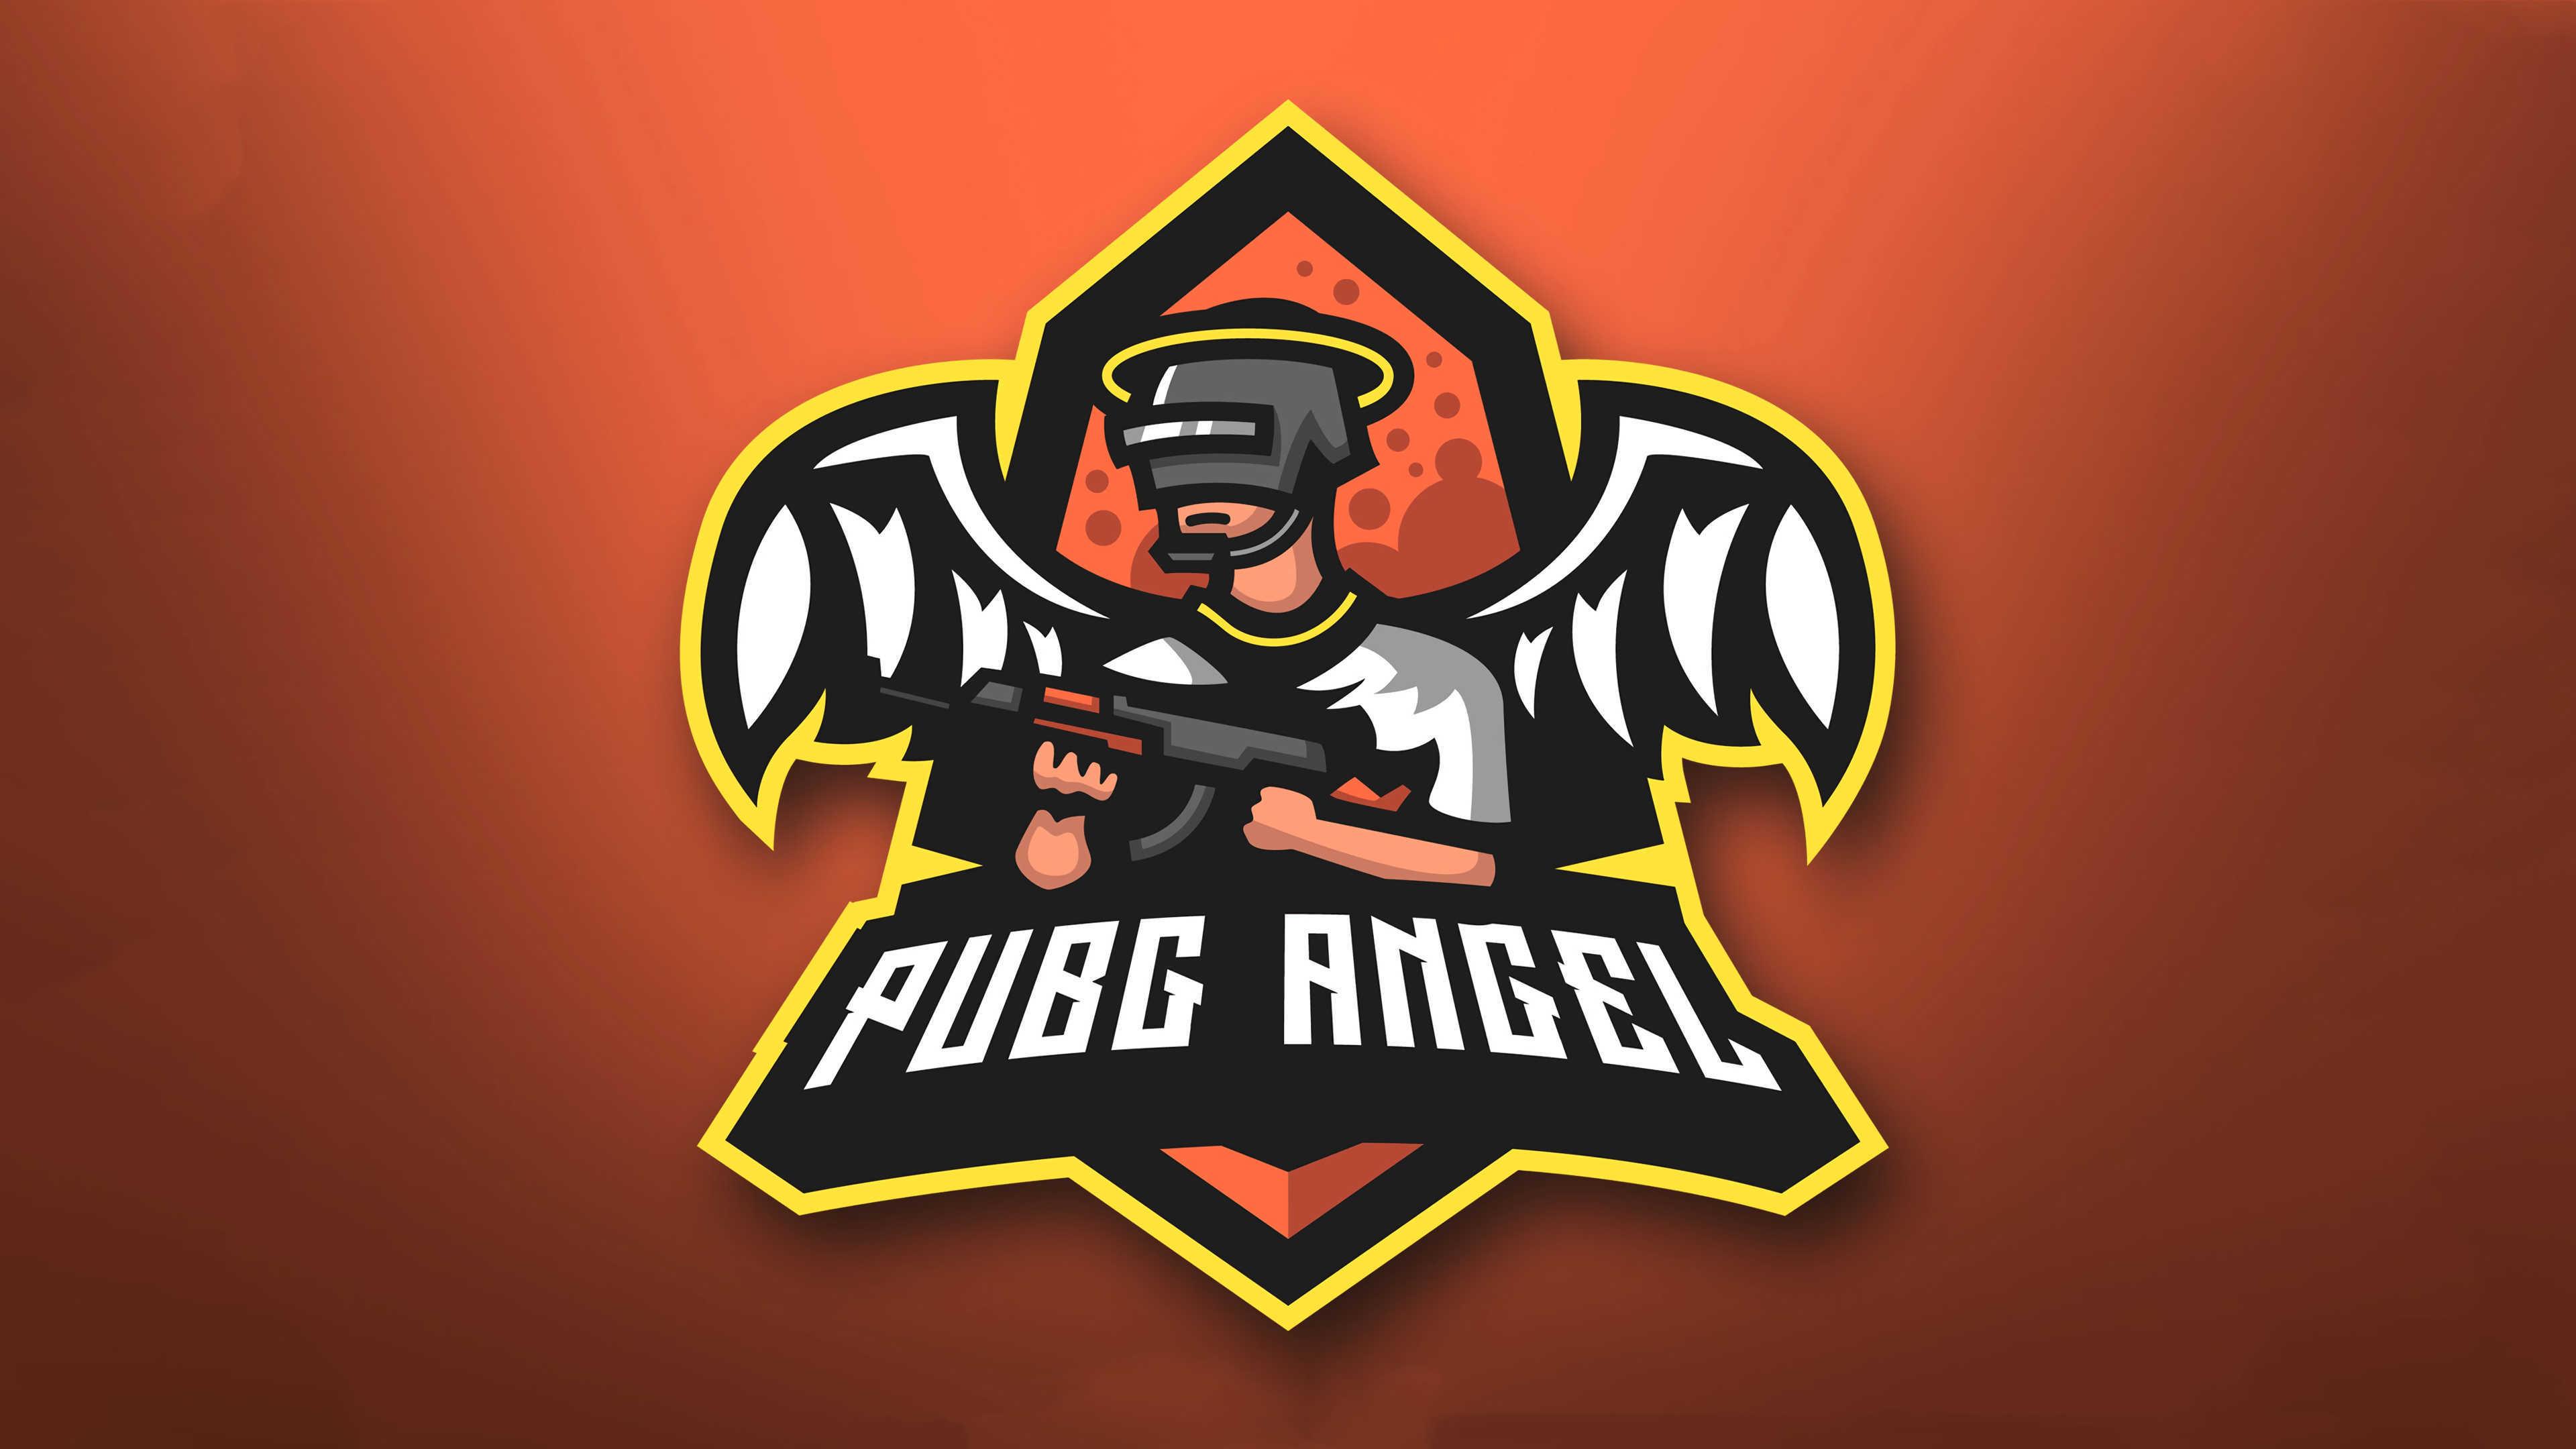 Free Download Pubg Logo Wallpaper Top Pubg 4k Background 4k